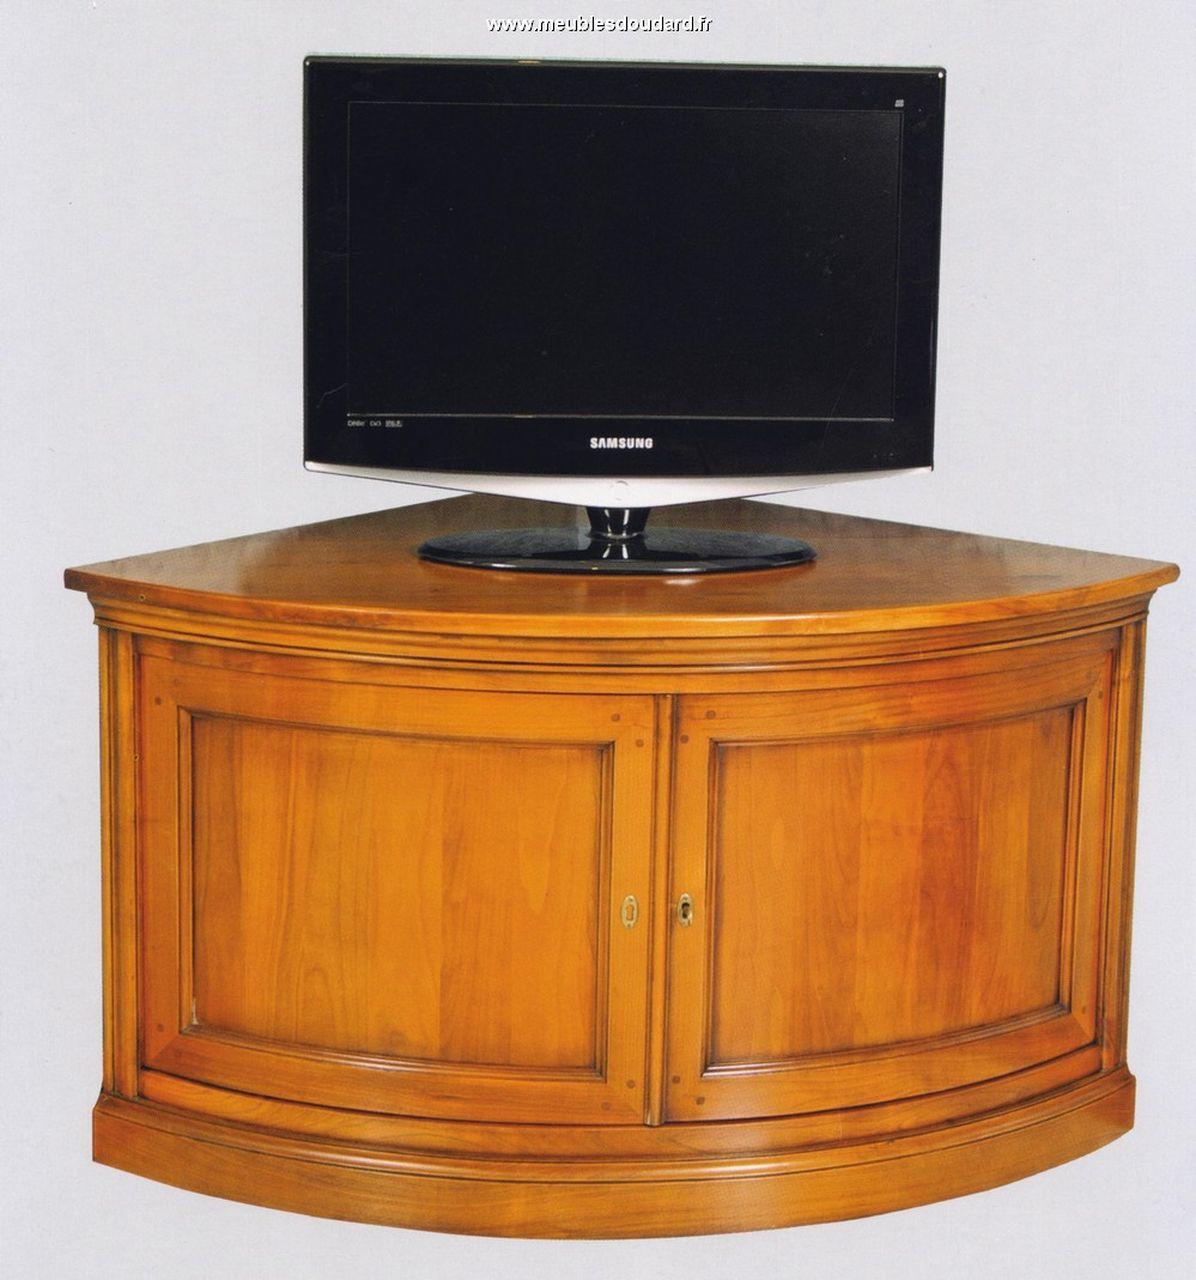 ecke kirschm bel ecke kirsche tv ecke tv schrank. Black Bedroom Furniture Sets. Home Design Ideas